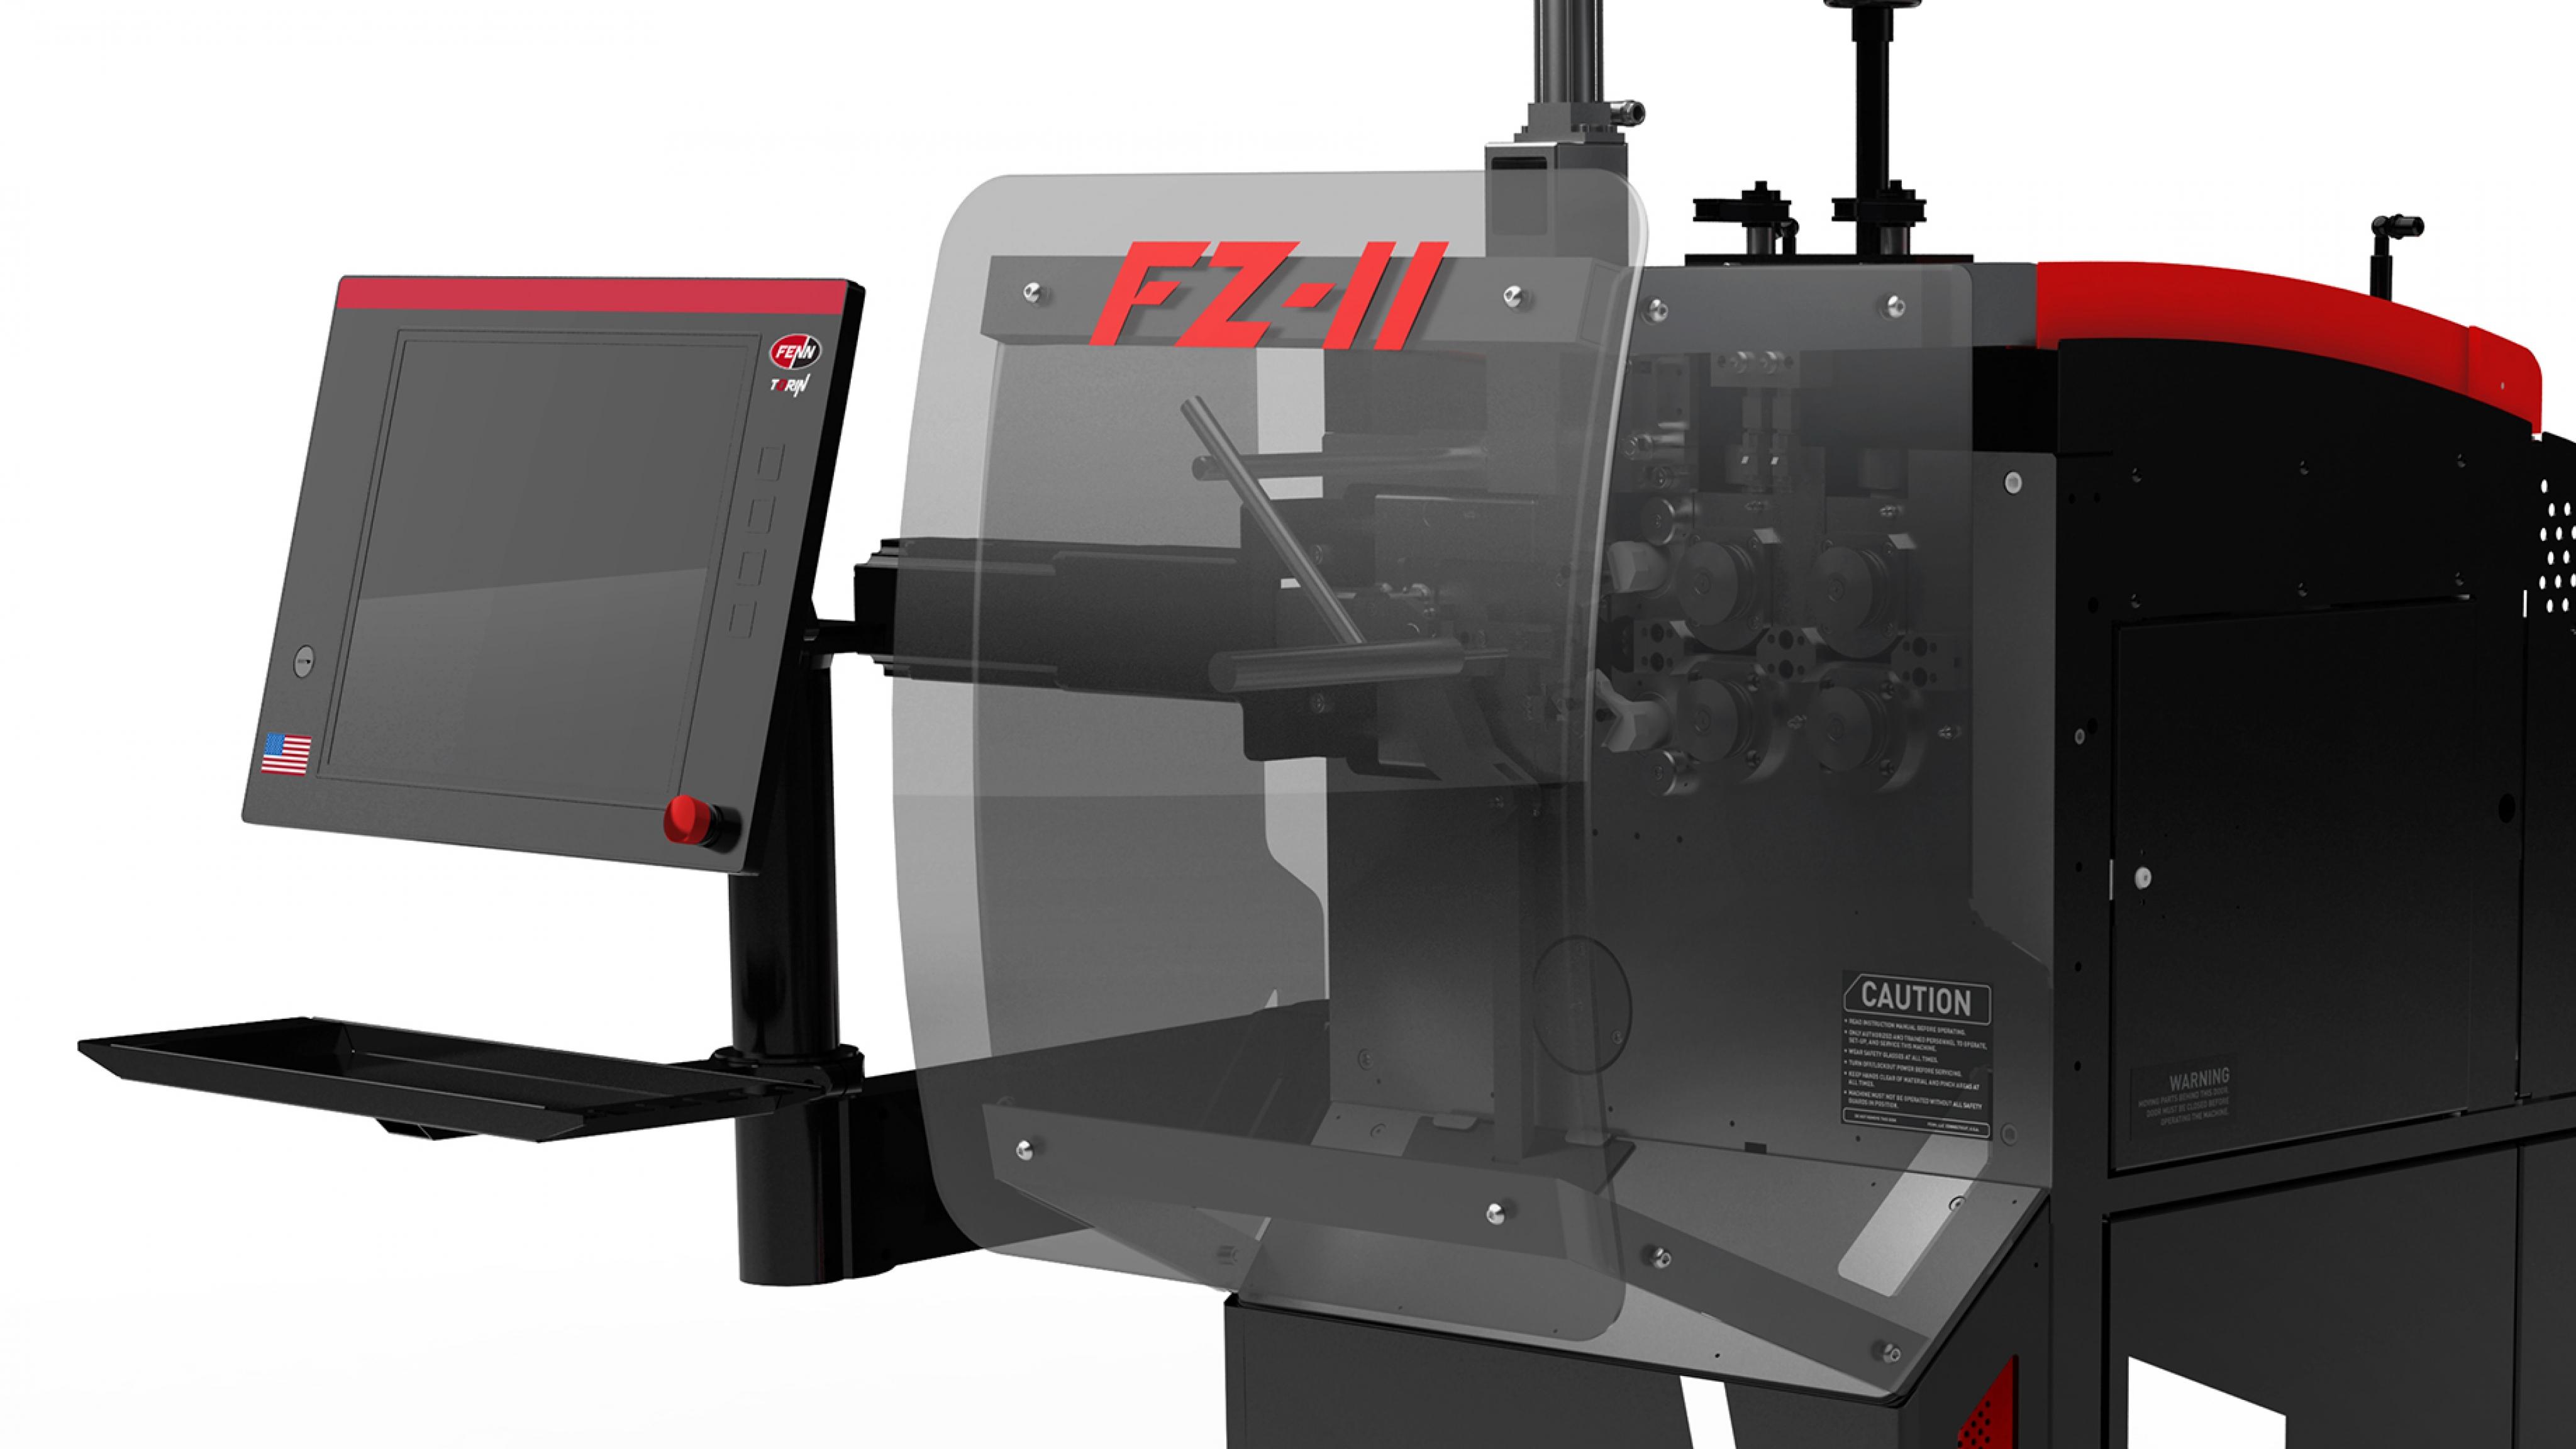 Fenn FZ-11 Spring Coiler | ROBRADY design